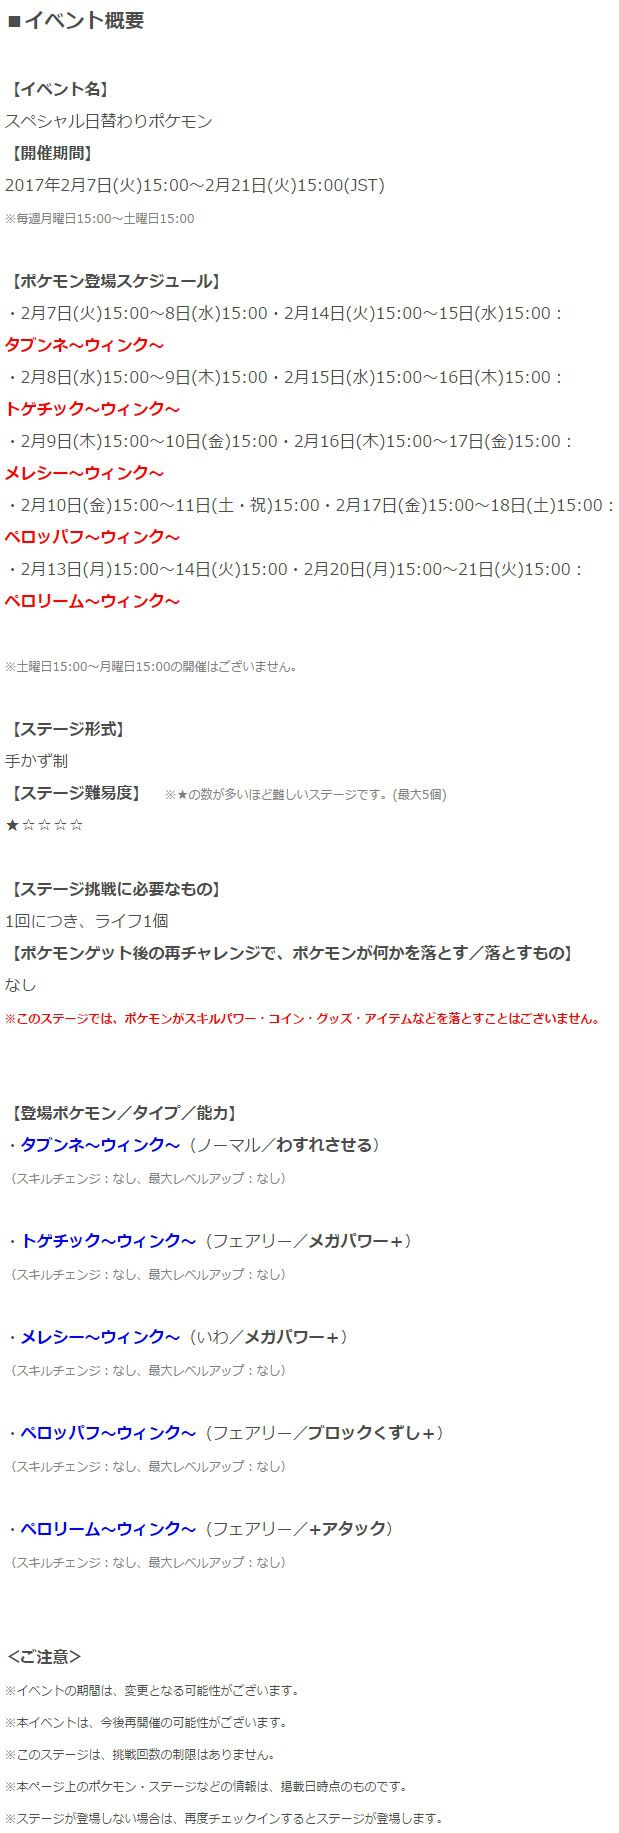 image_8107.jpg